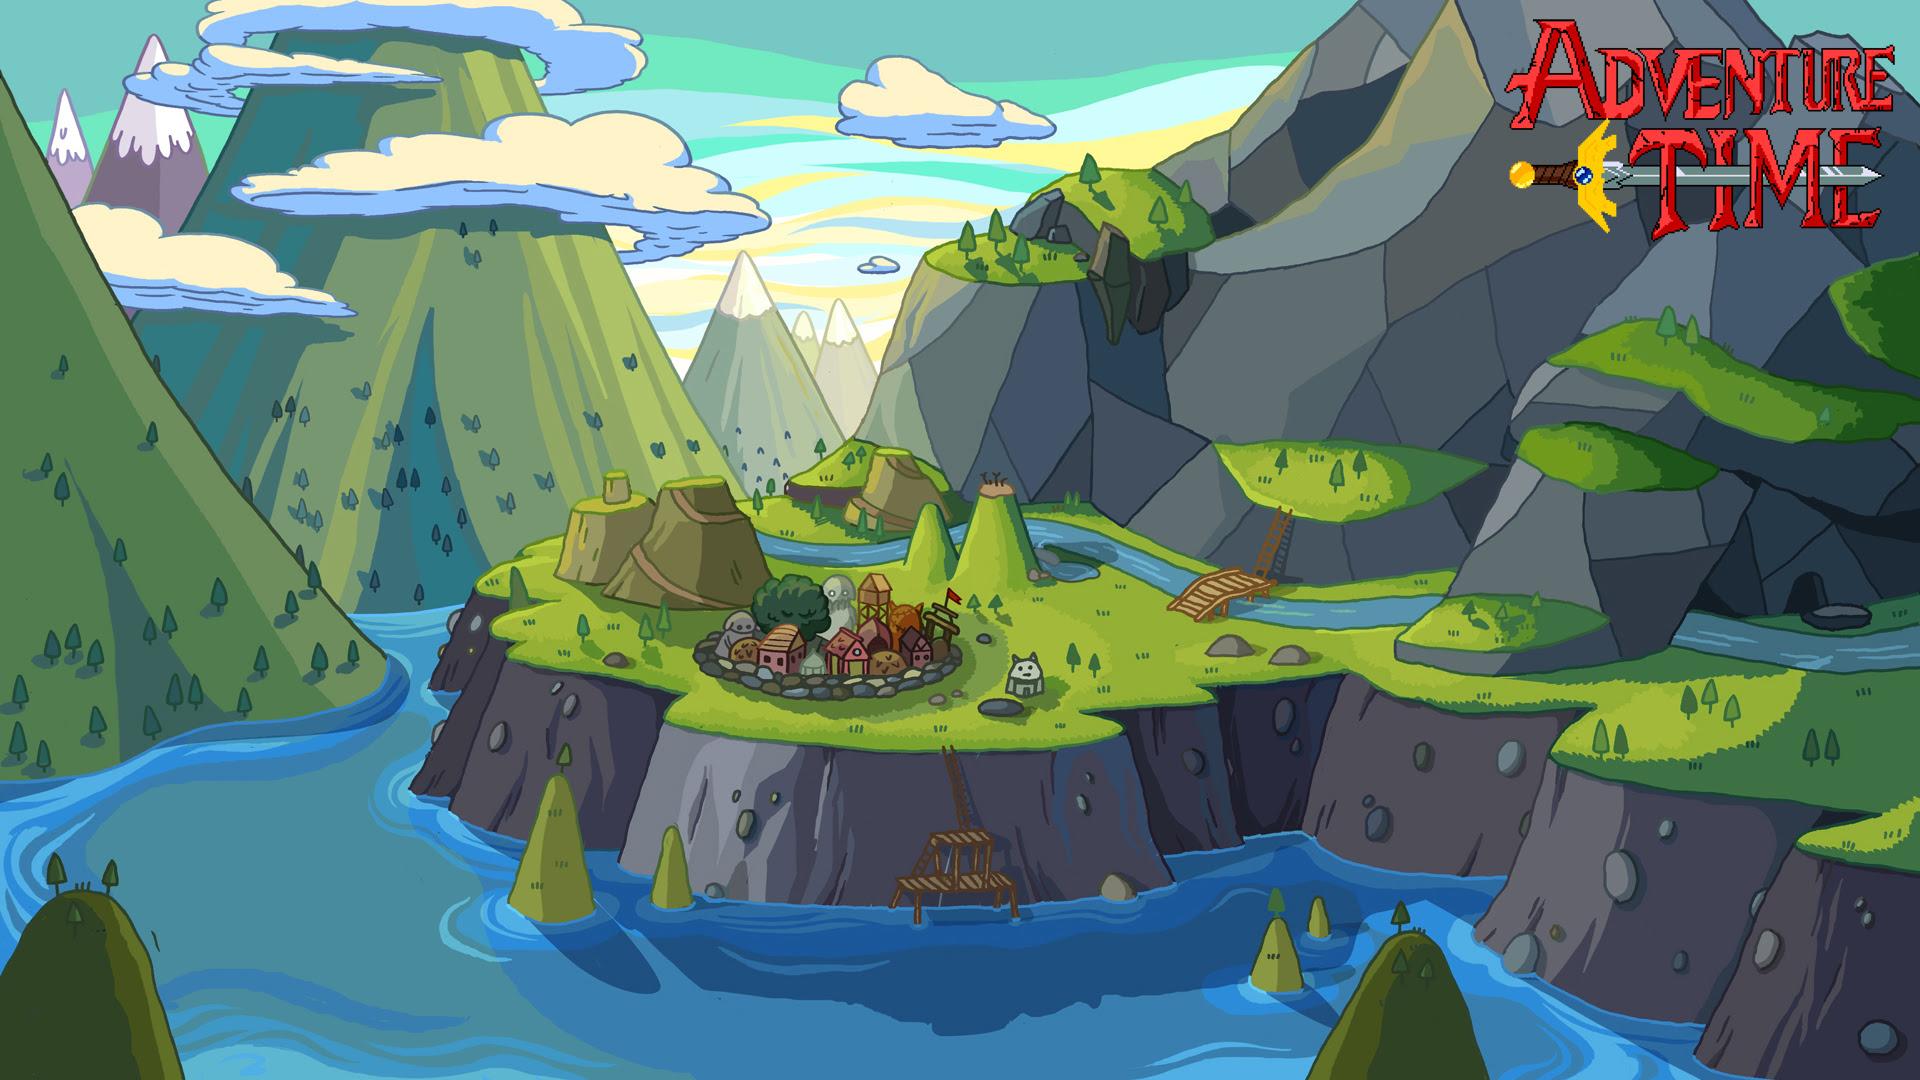 Download Adventure Time Wallpaper  Wallpup.com